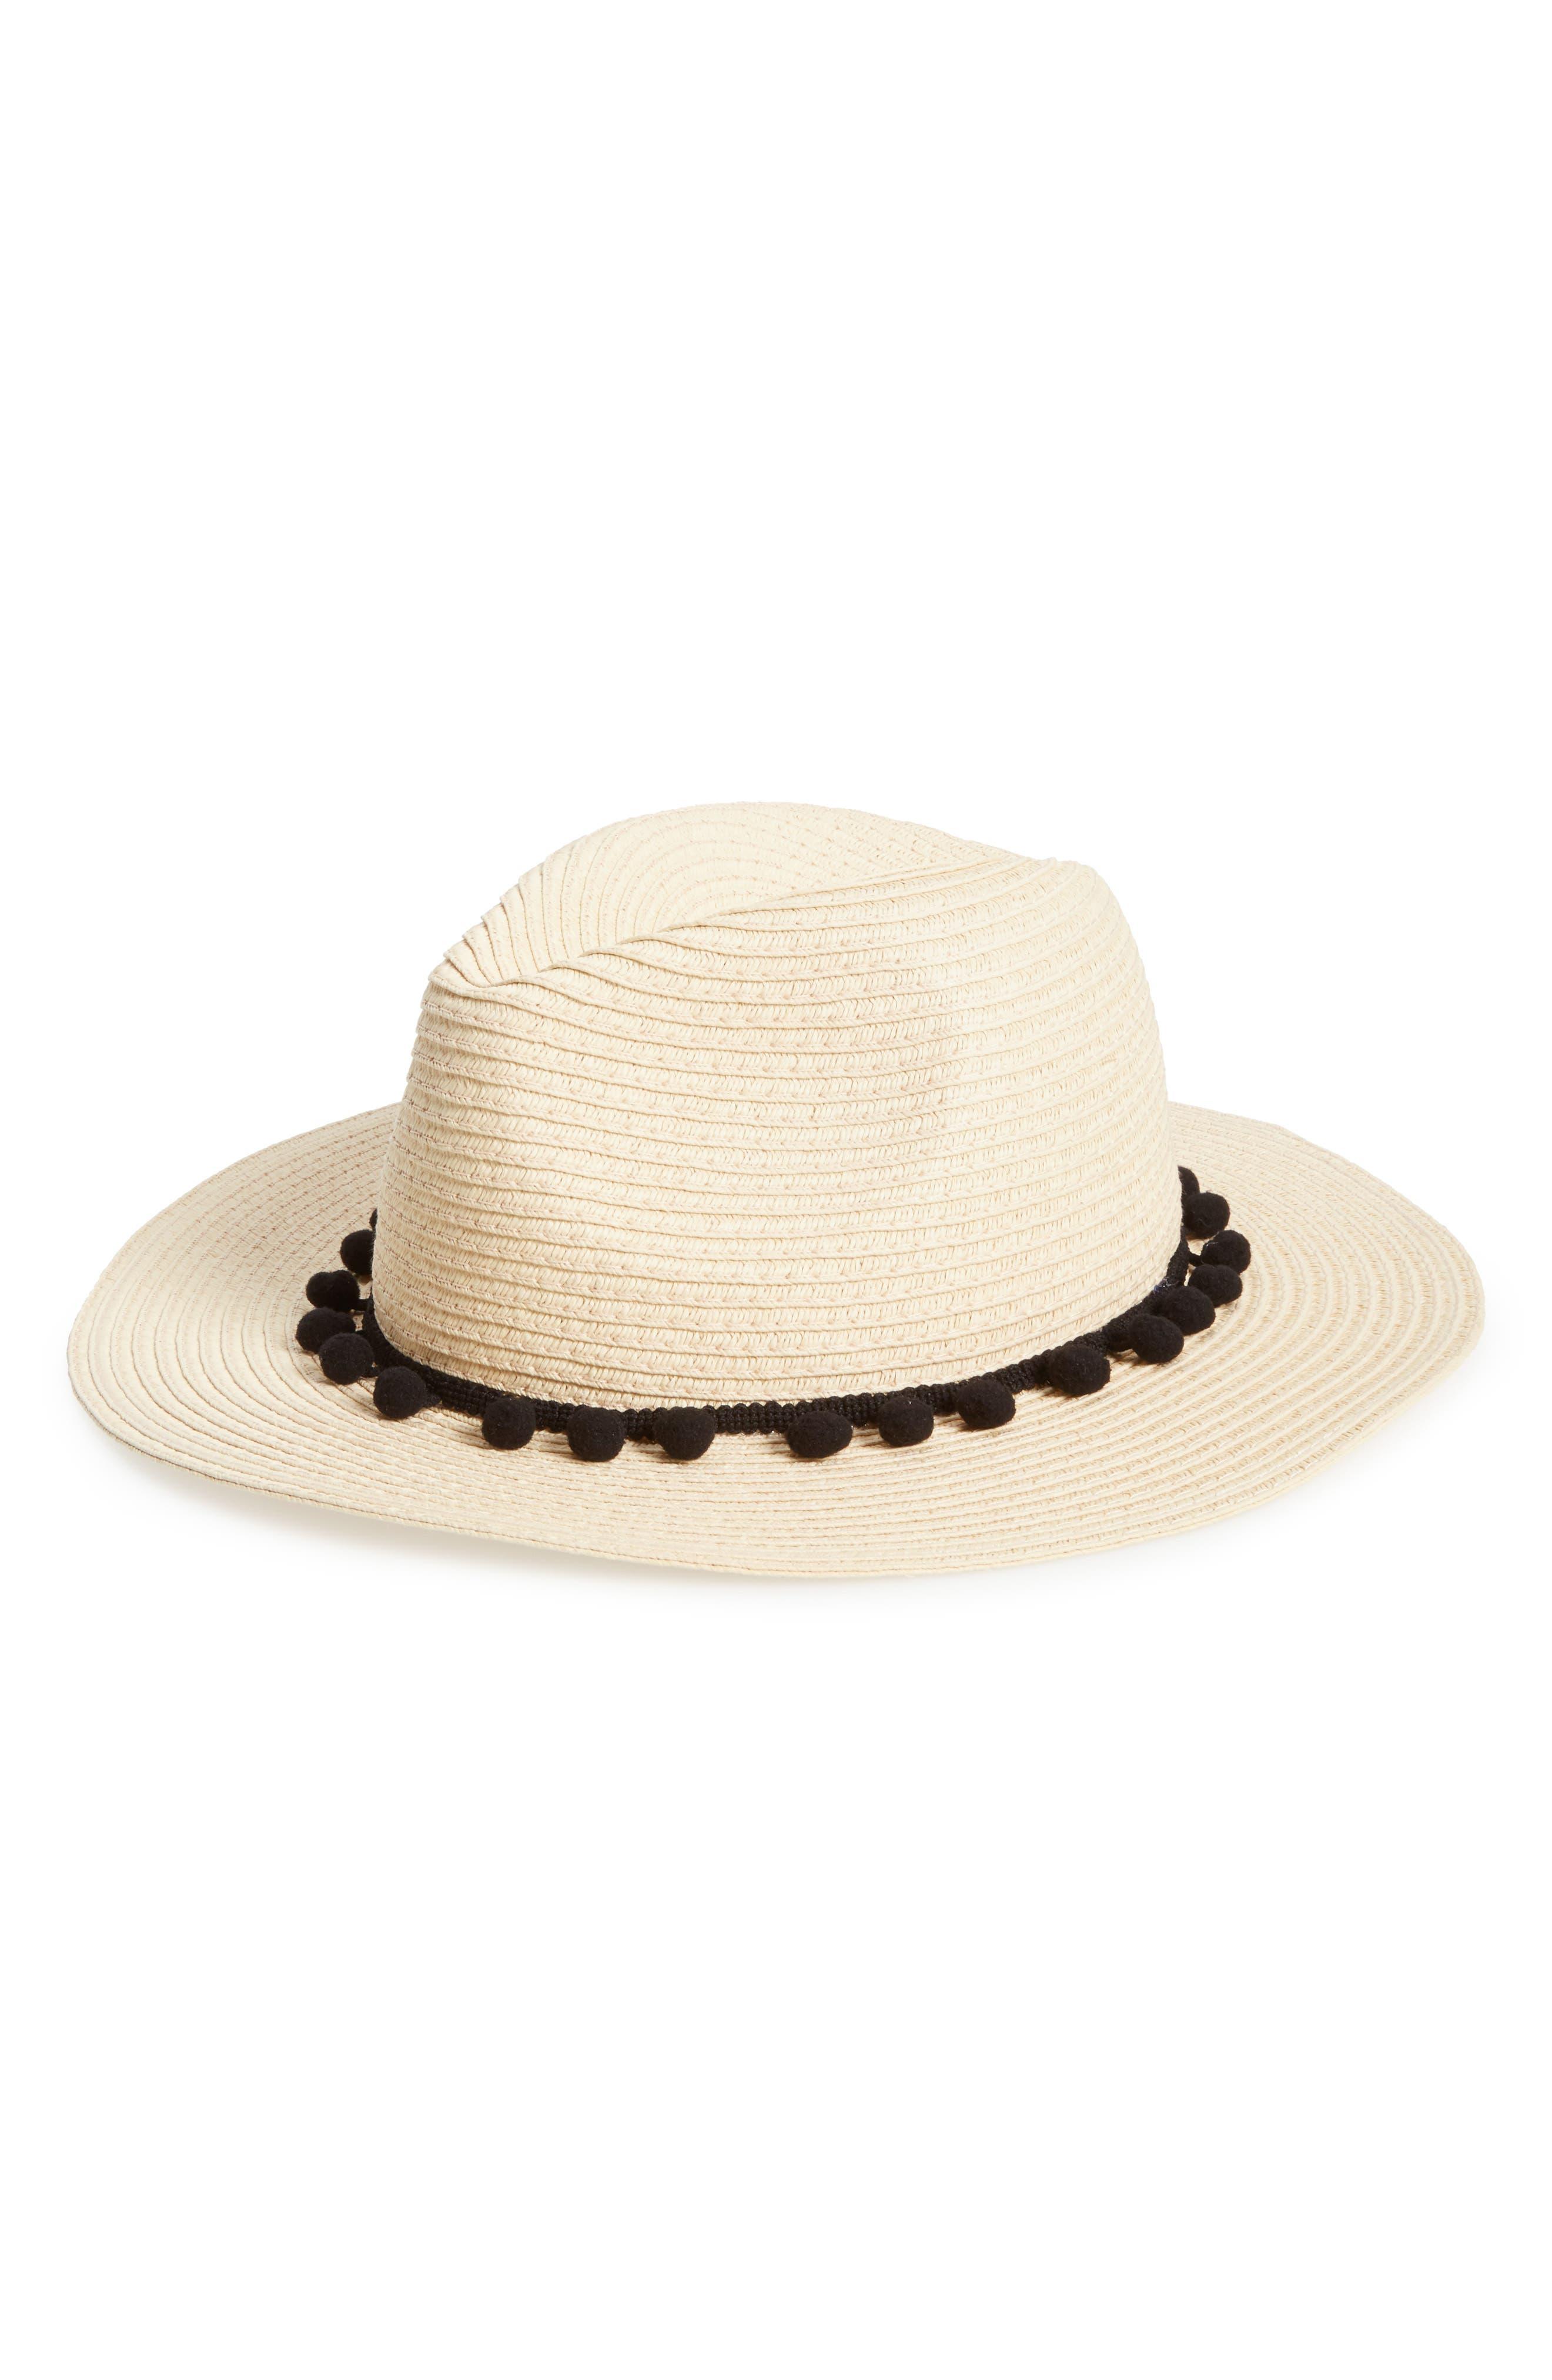 Pom Pom Panama Hat,                         Main,                         color, Natural